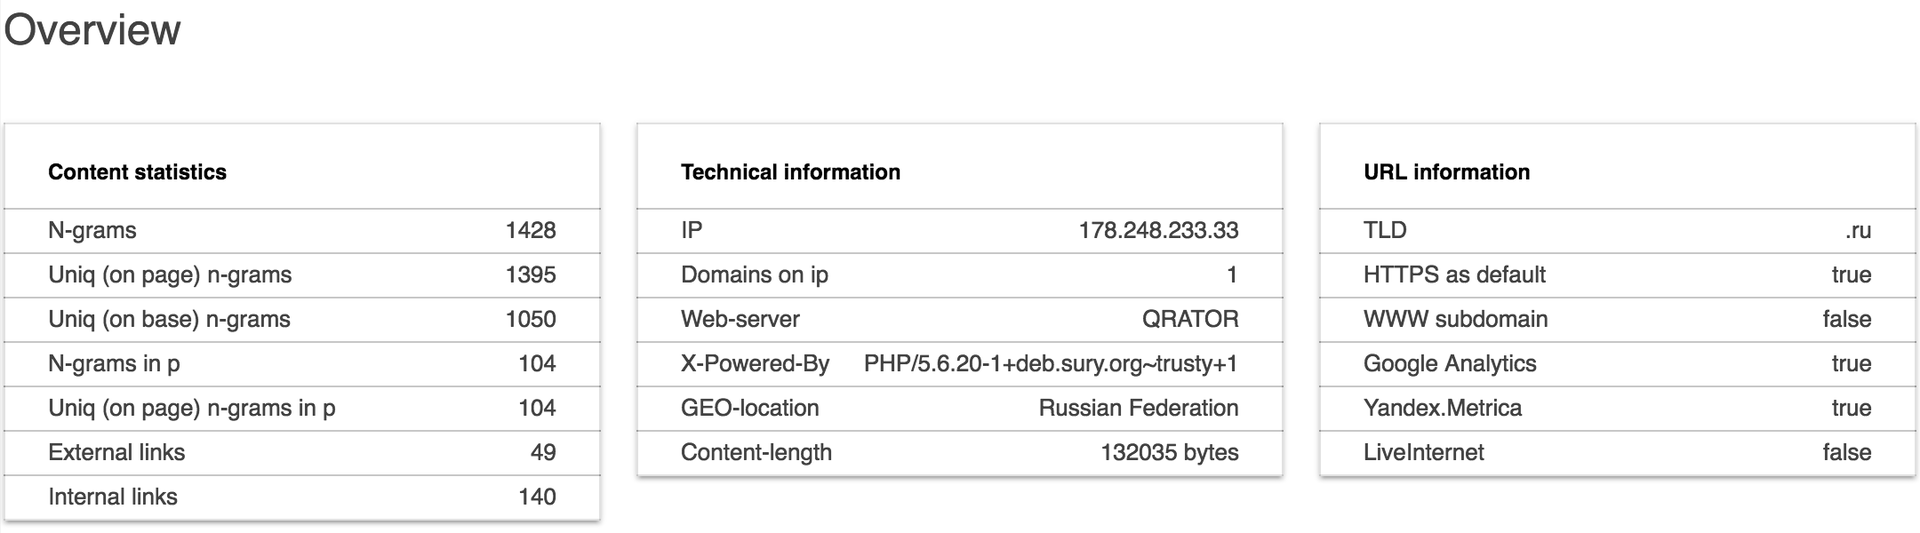 Пересечение морд доменов топ 1,000,000 по N-граммам - 7